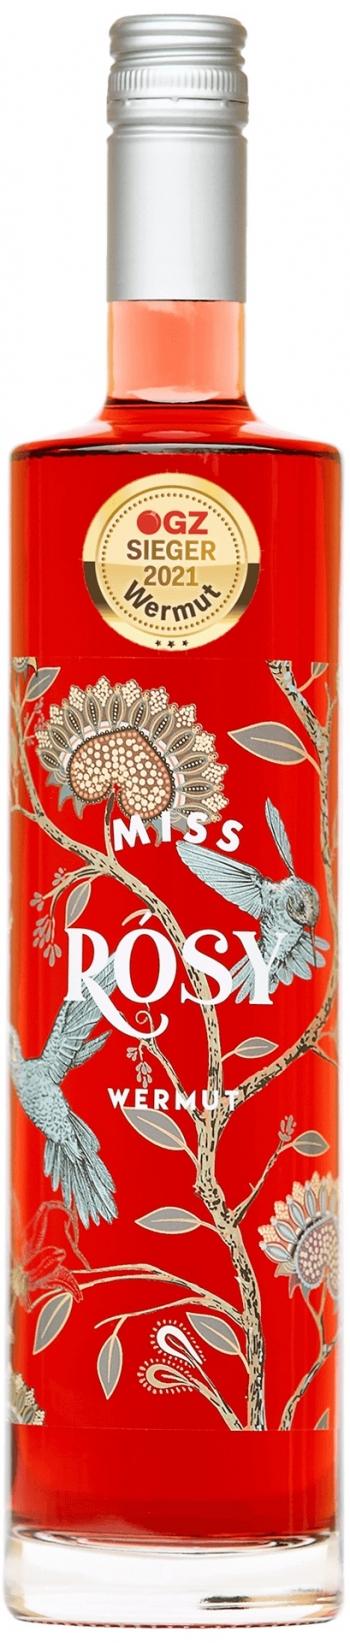 Miss Rosy Rose´ Wermut, Strohmaier